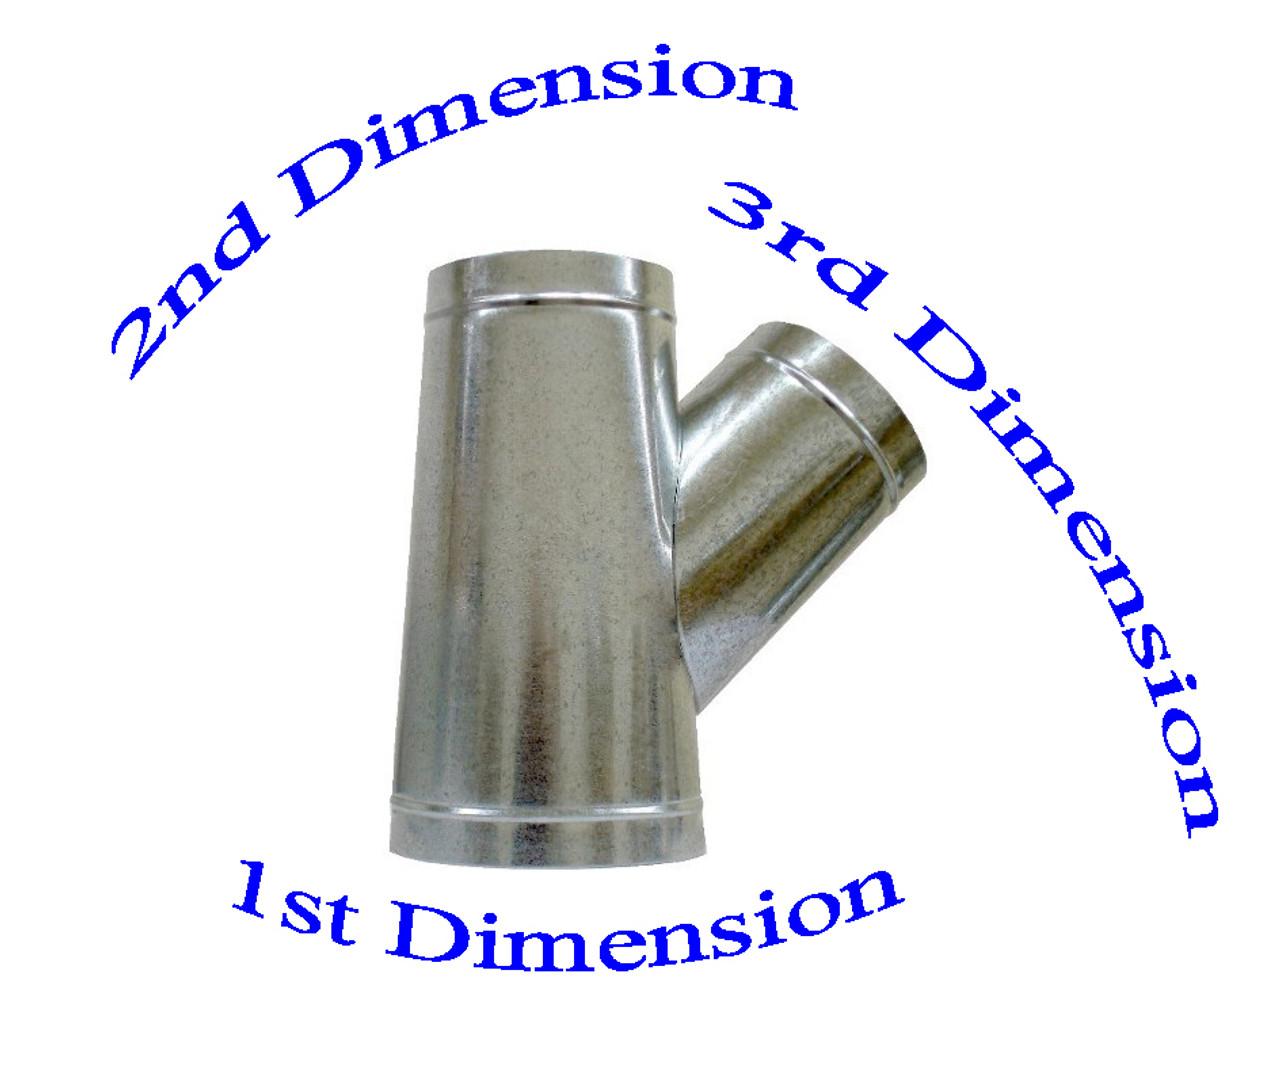 "5"" x 5"" x 5"" Reverse Flow Duct Wye Branch"